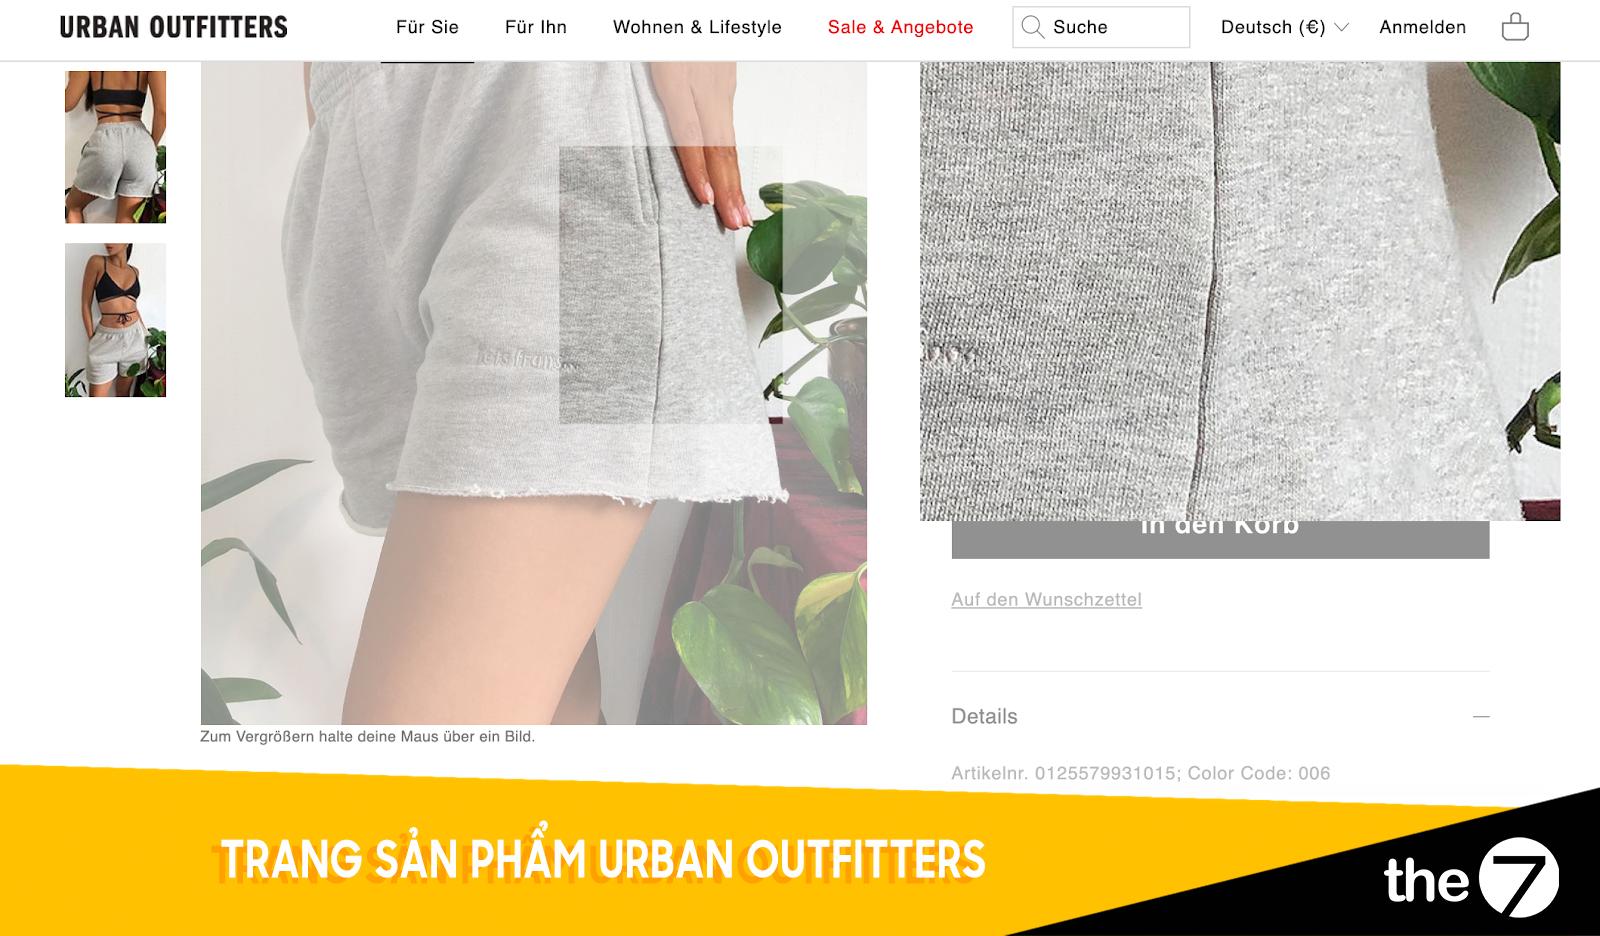 Trang sản phẩm Urban Outfitters